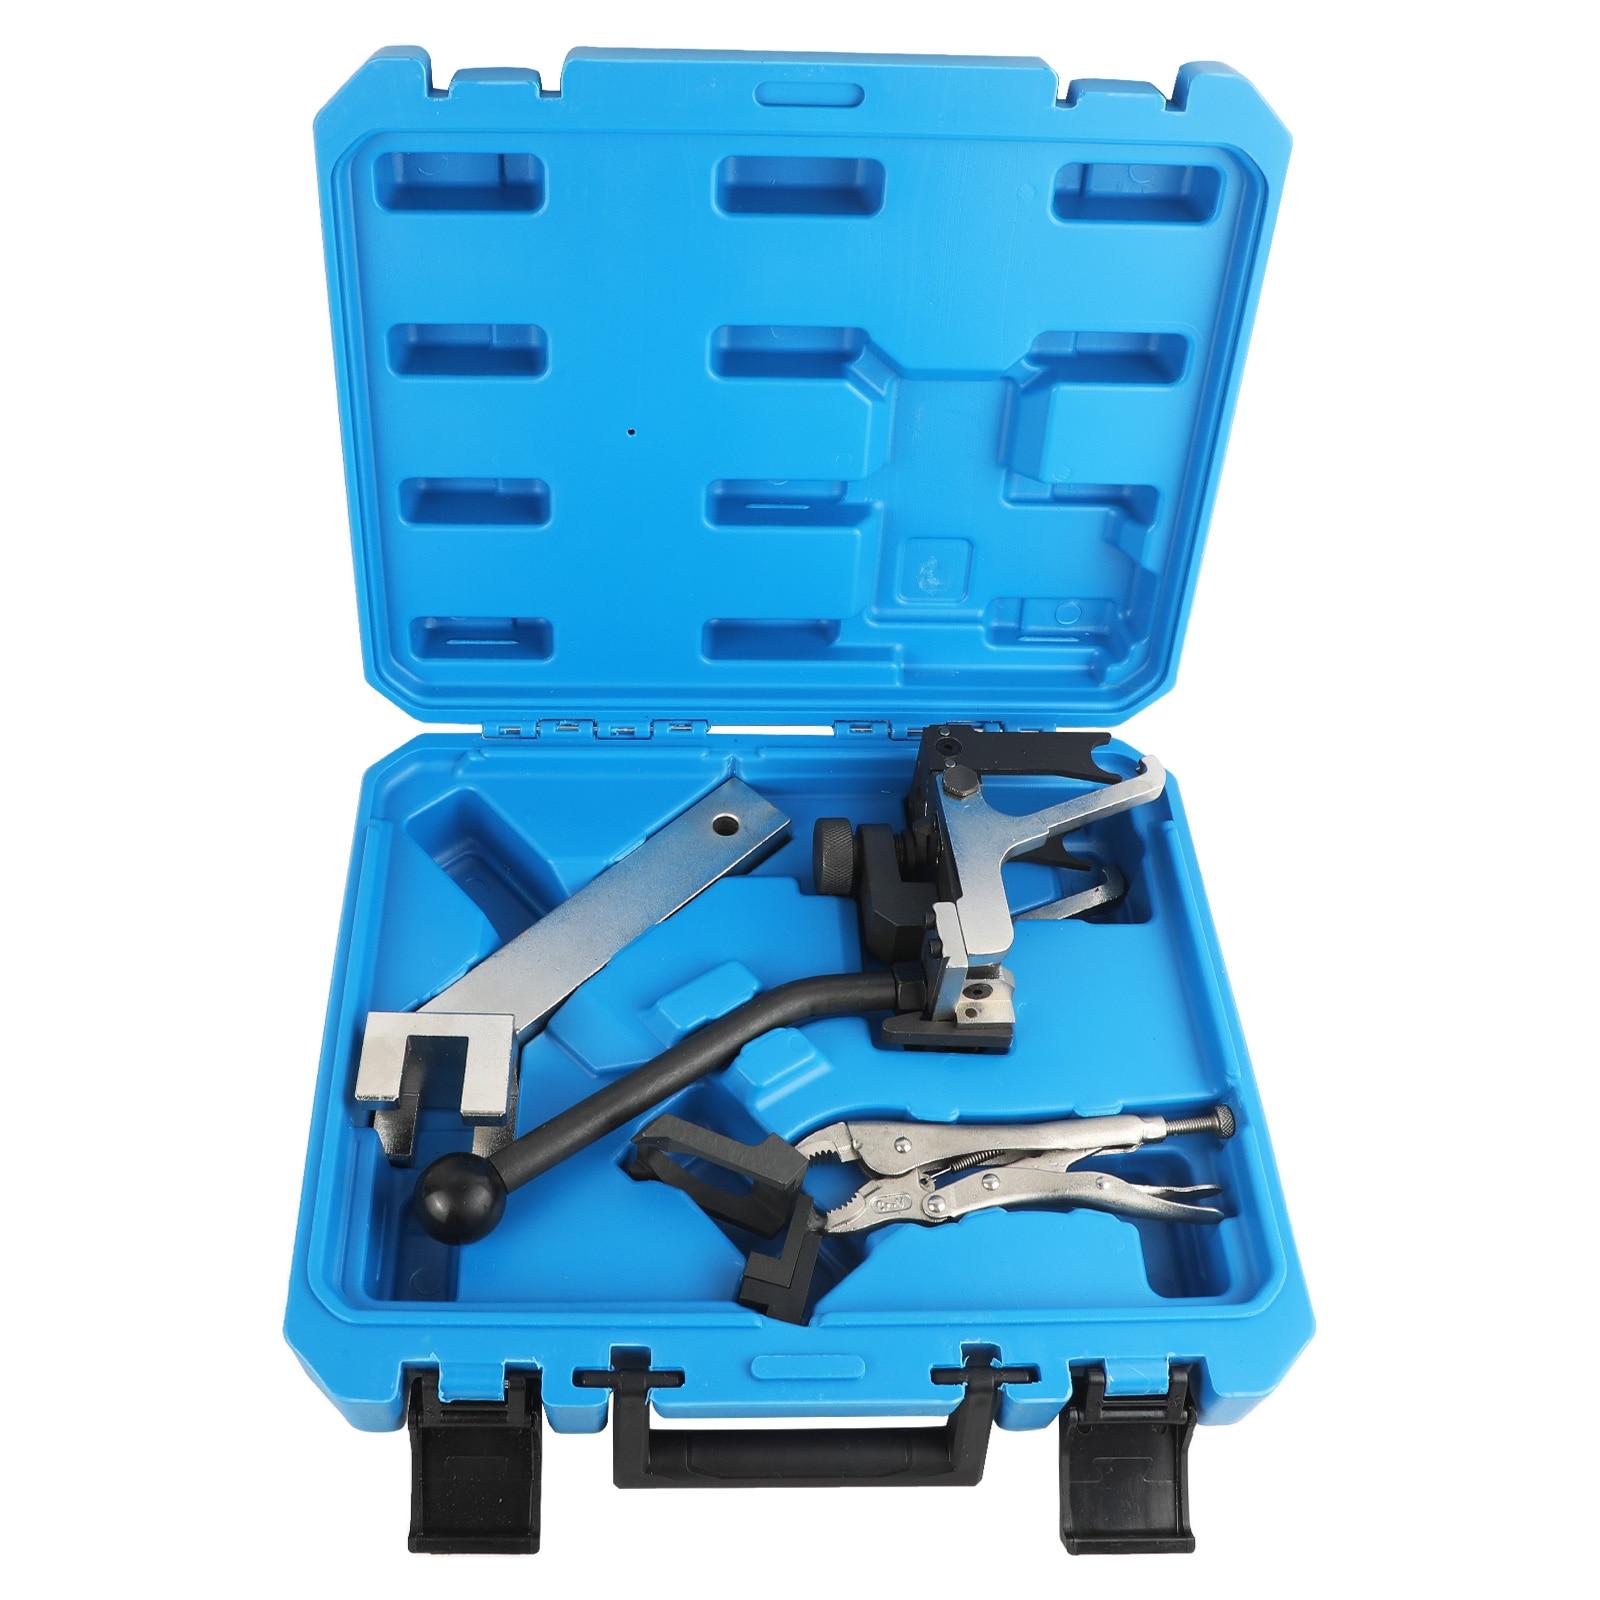 Valve Pressure Spring Installer/Remover Tool Plier For BMW Mini N12 N14 N16 N18 Engine Timing Tool For Peugeot Citroen 1.6T